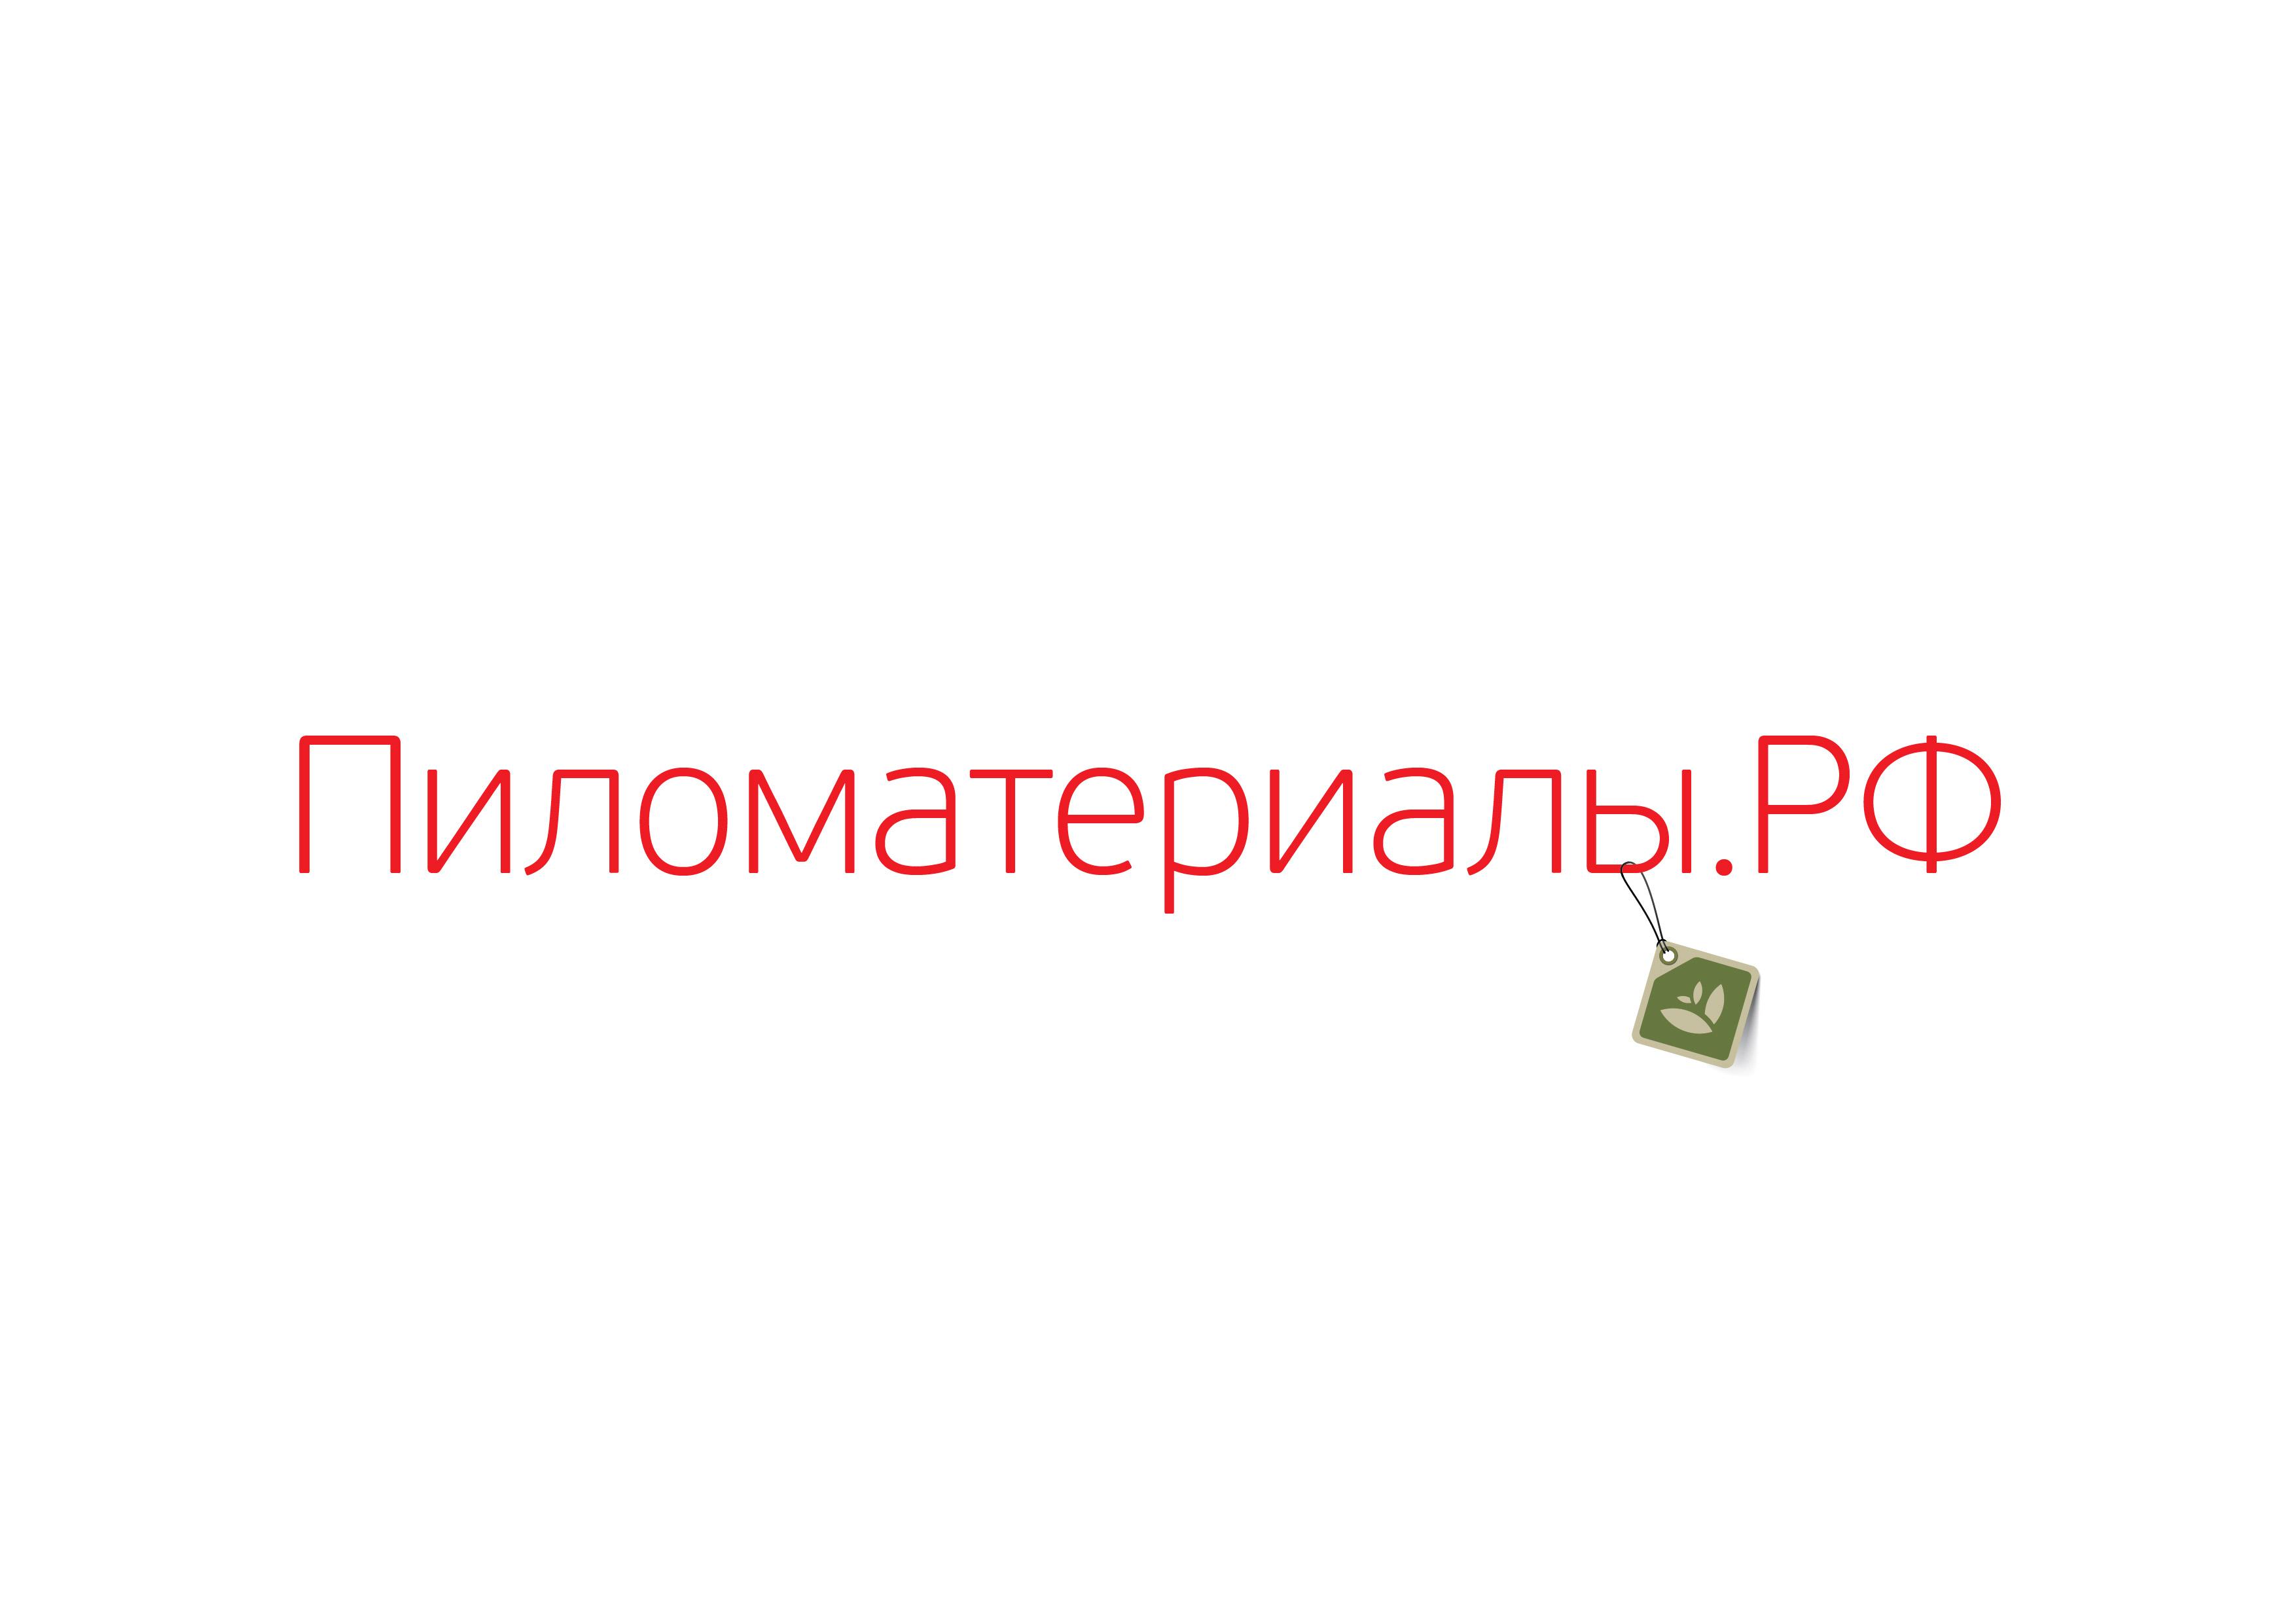 "Создание логотипа и фирменного стиля ""Пиломатериалы.РФ"" фото f_54252f9e1714800a.jpg"